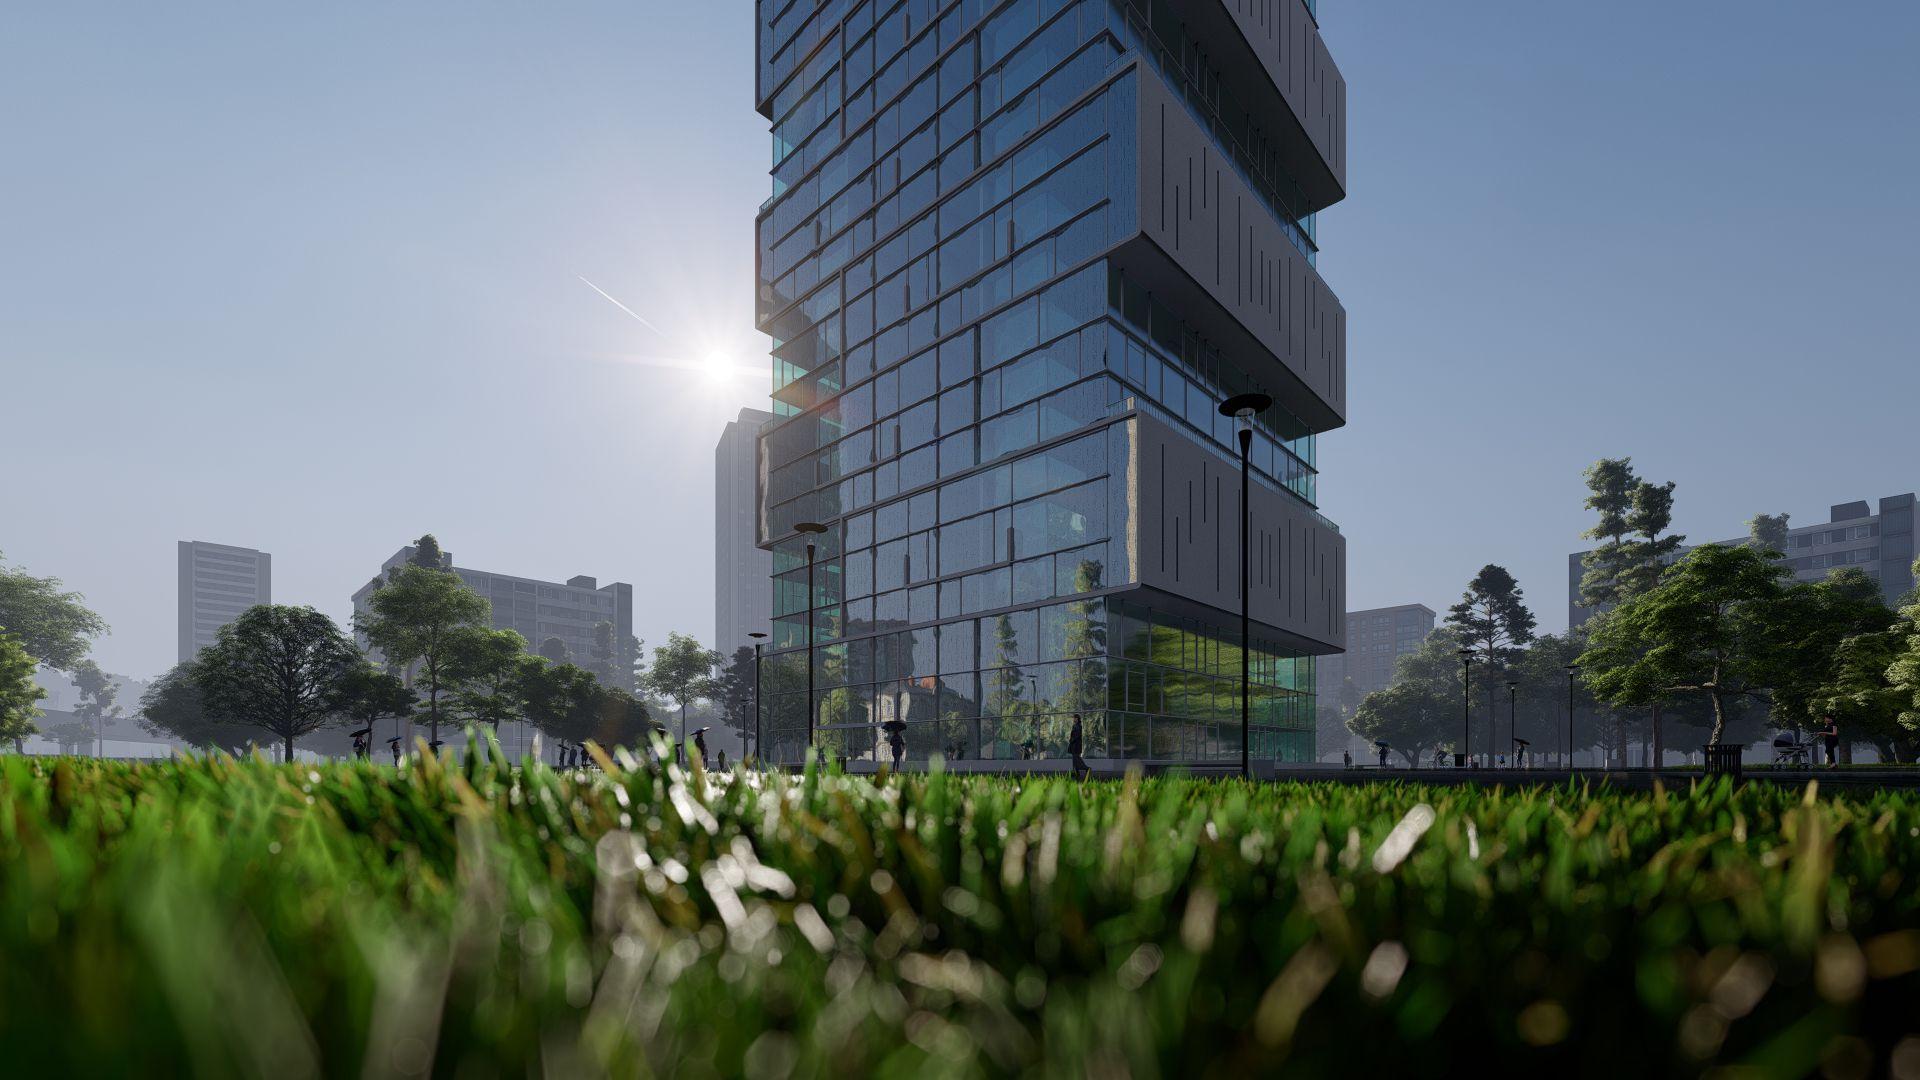 arhitektuurne 3d visualiseerimine pilve hoone 3 9